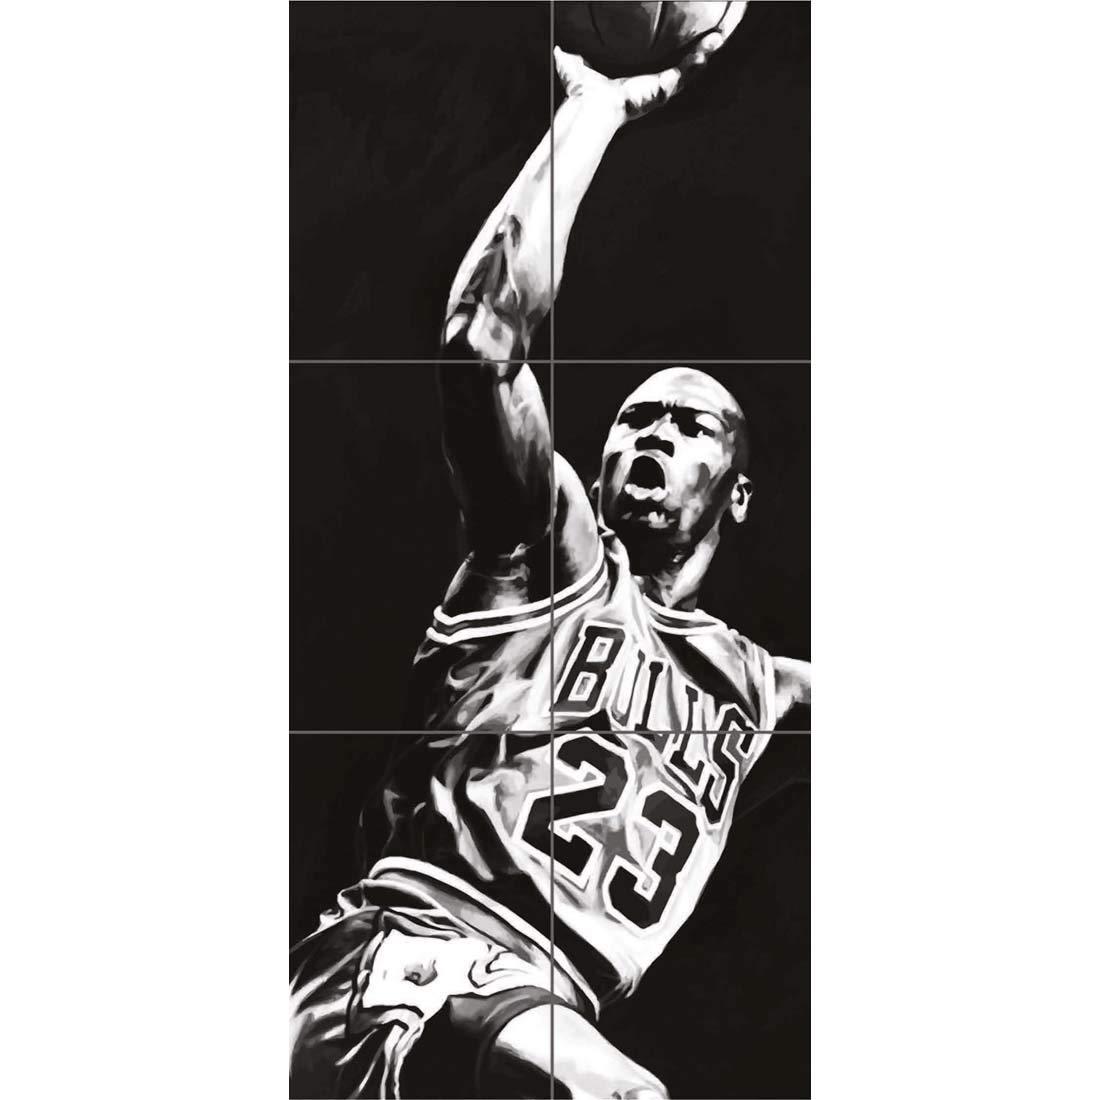 Amazon.com: Michael Jordan Baloncesto Legend Póster de Star ...